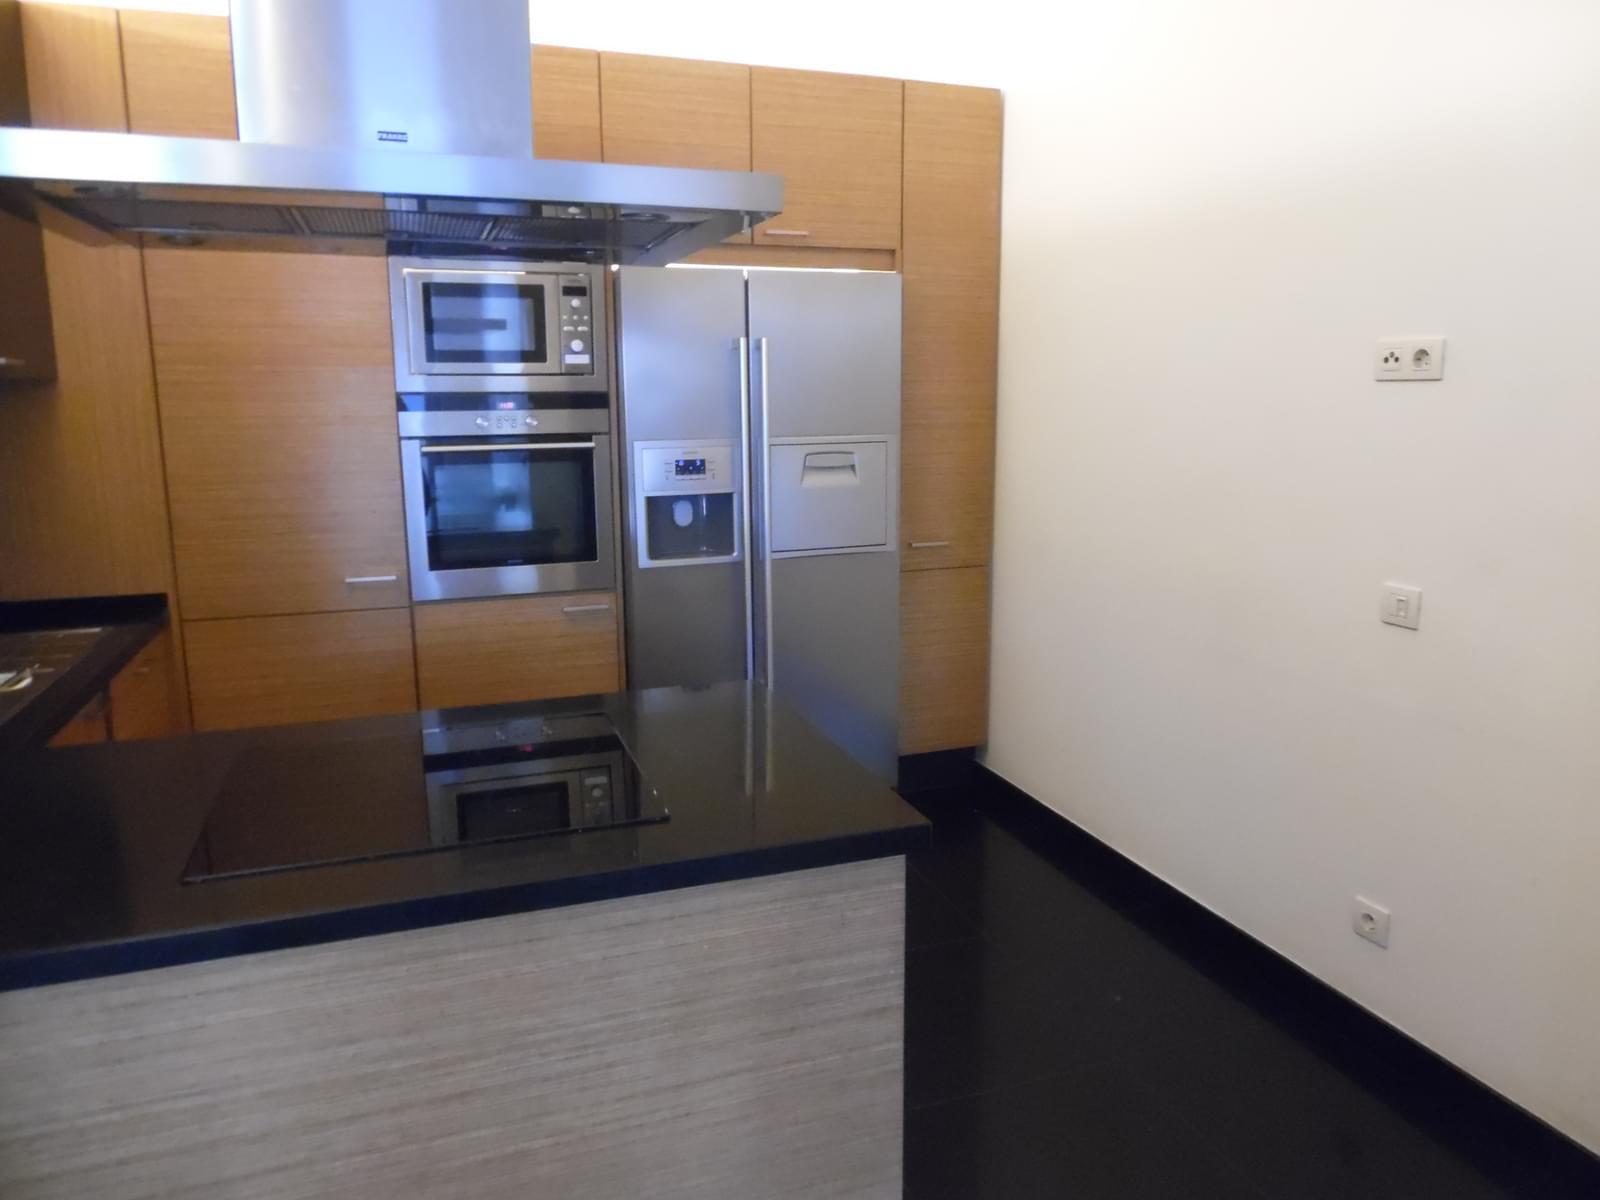 pf17454-apartamento-t4-lisboa-08a6e251-745a-4c77-b454-abcdcfc43f6d